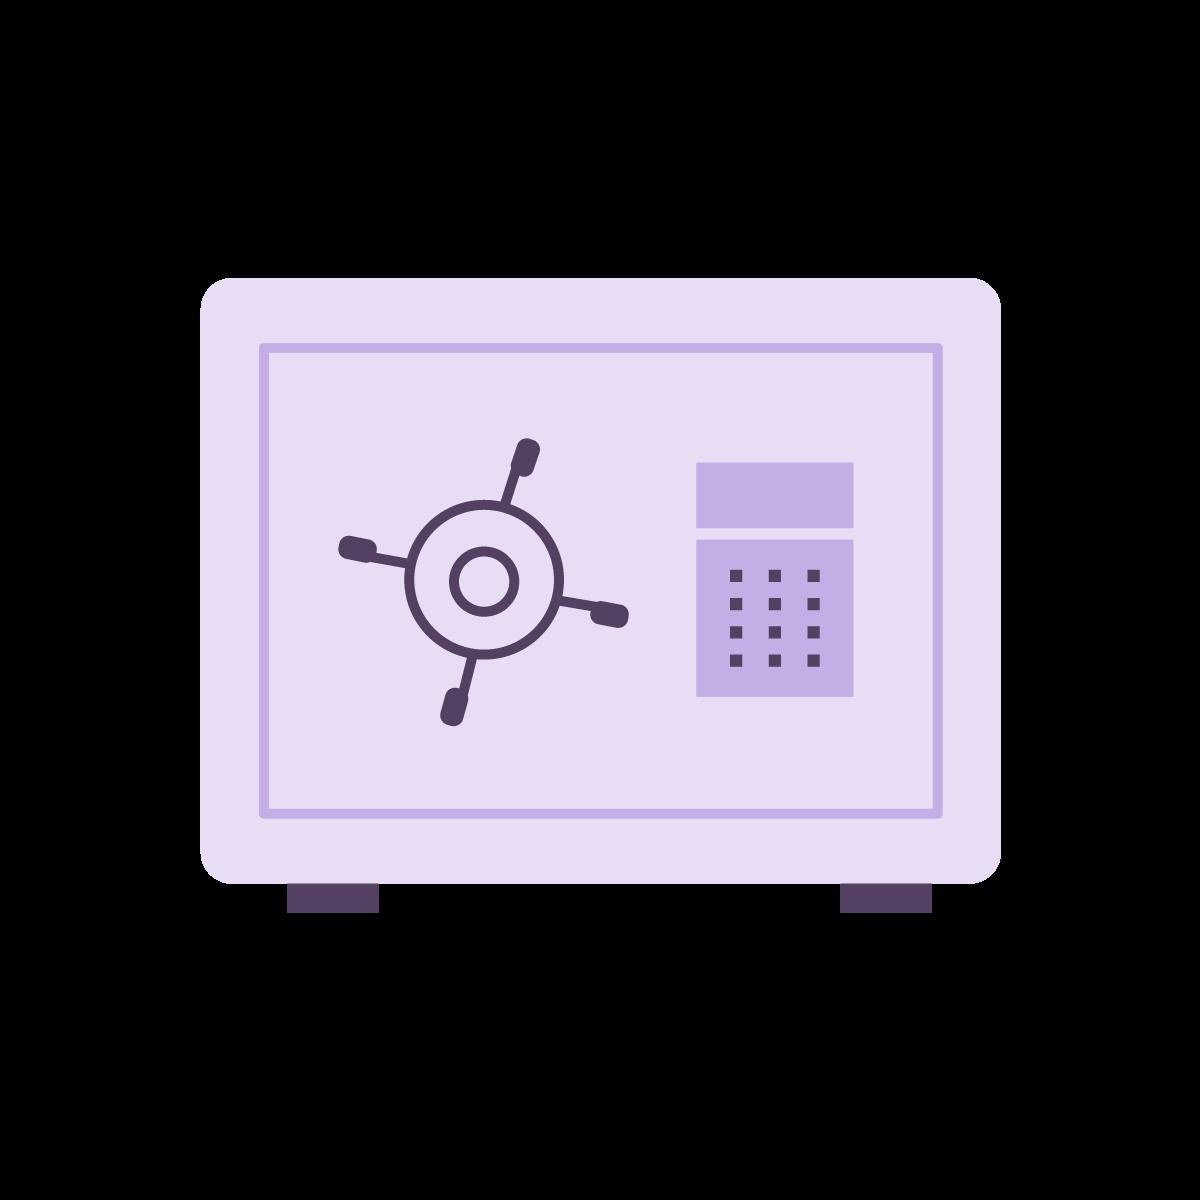 Icon of safe box